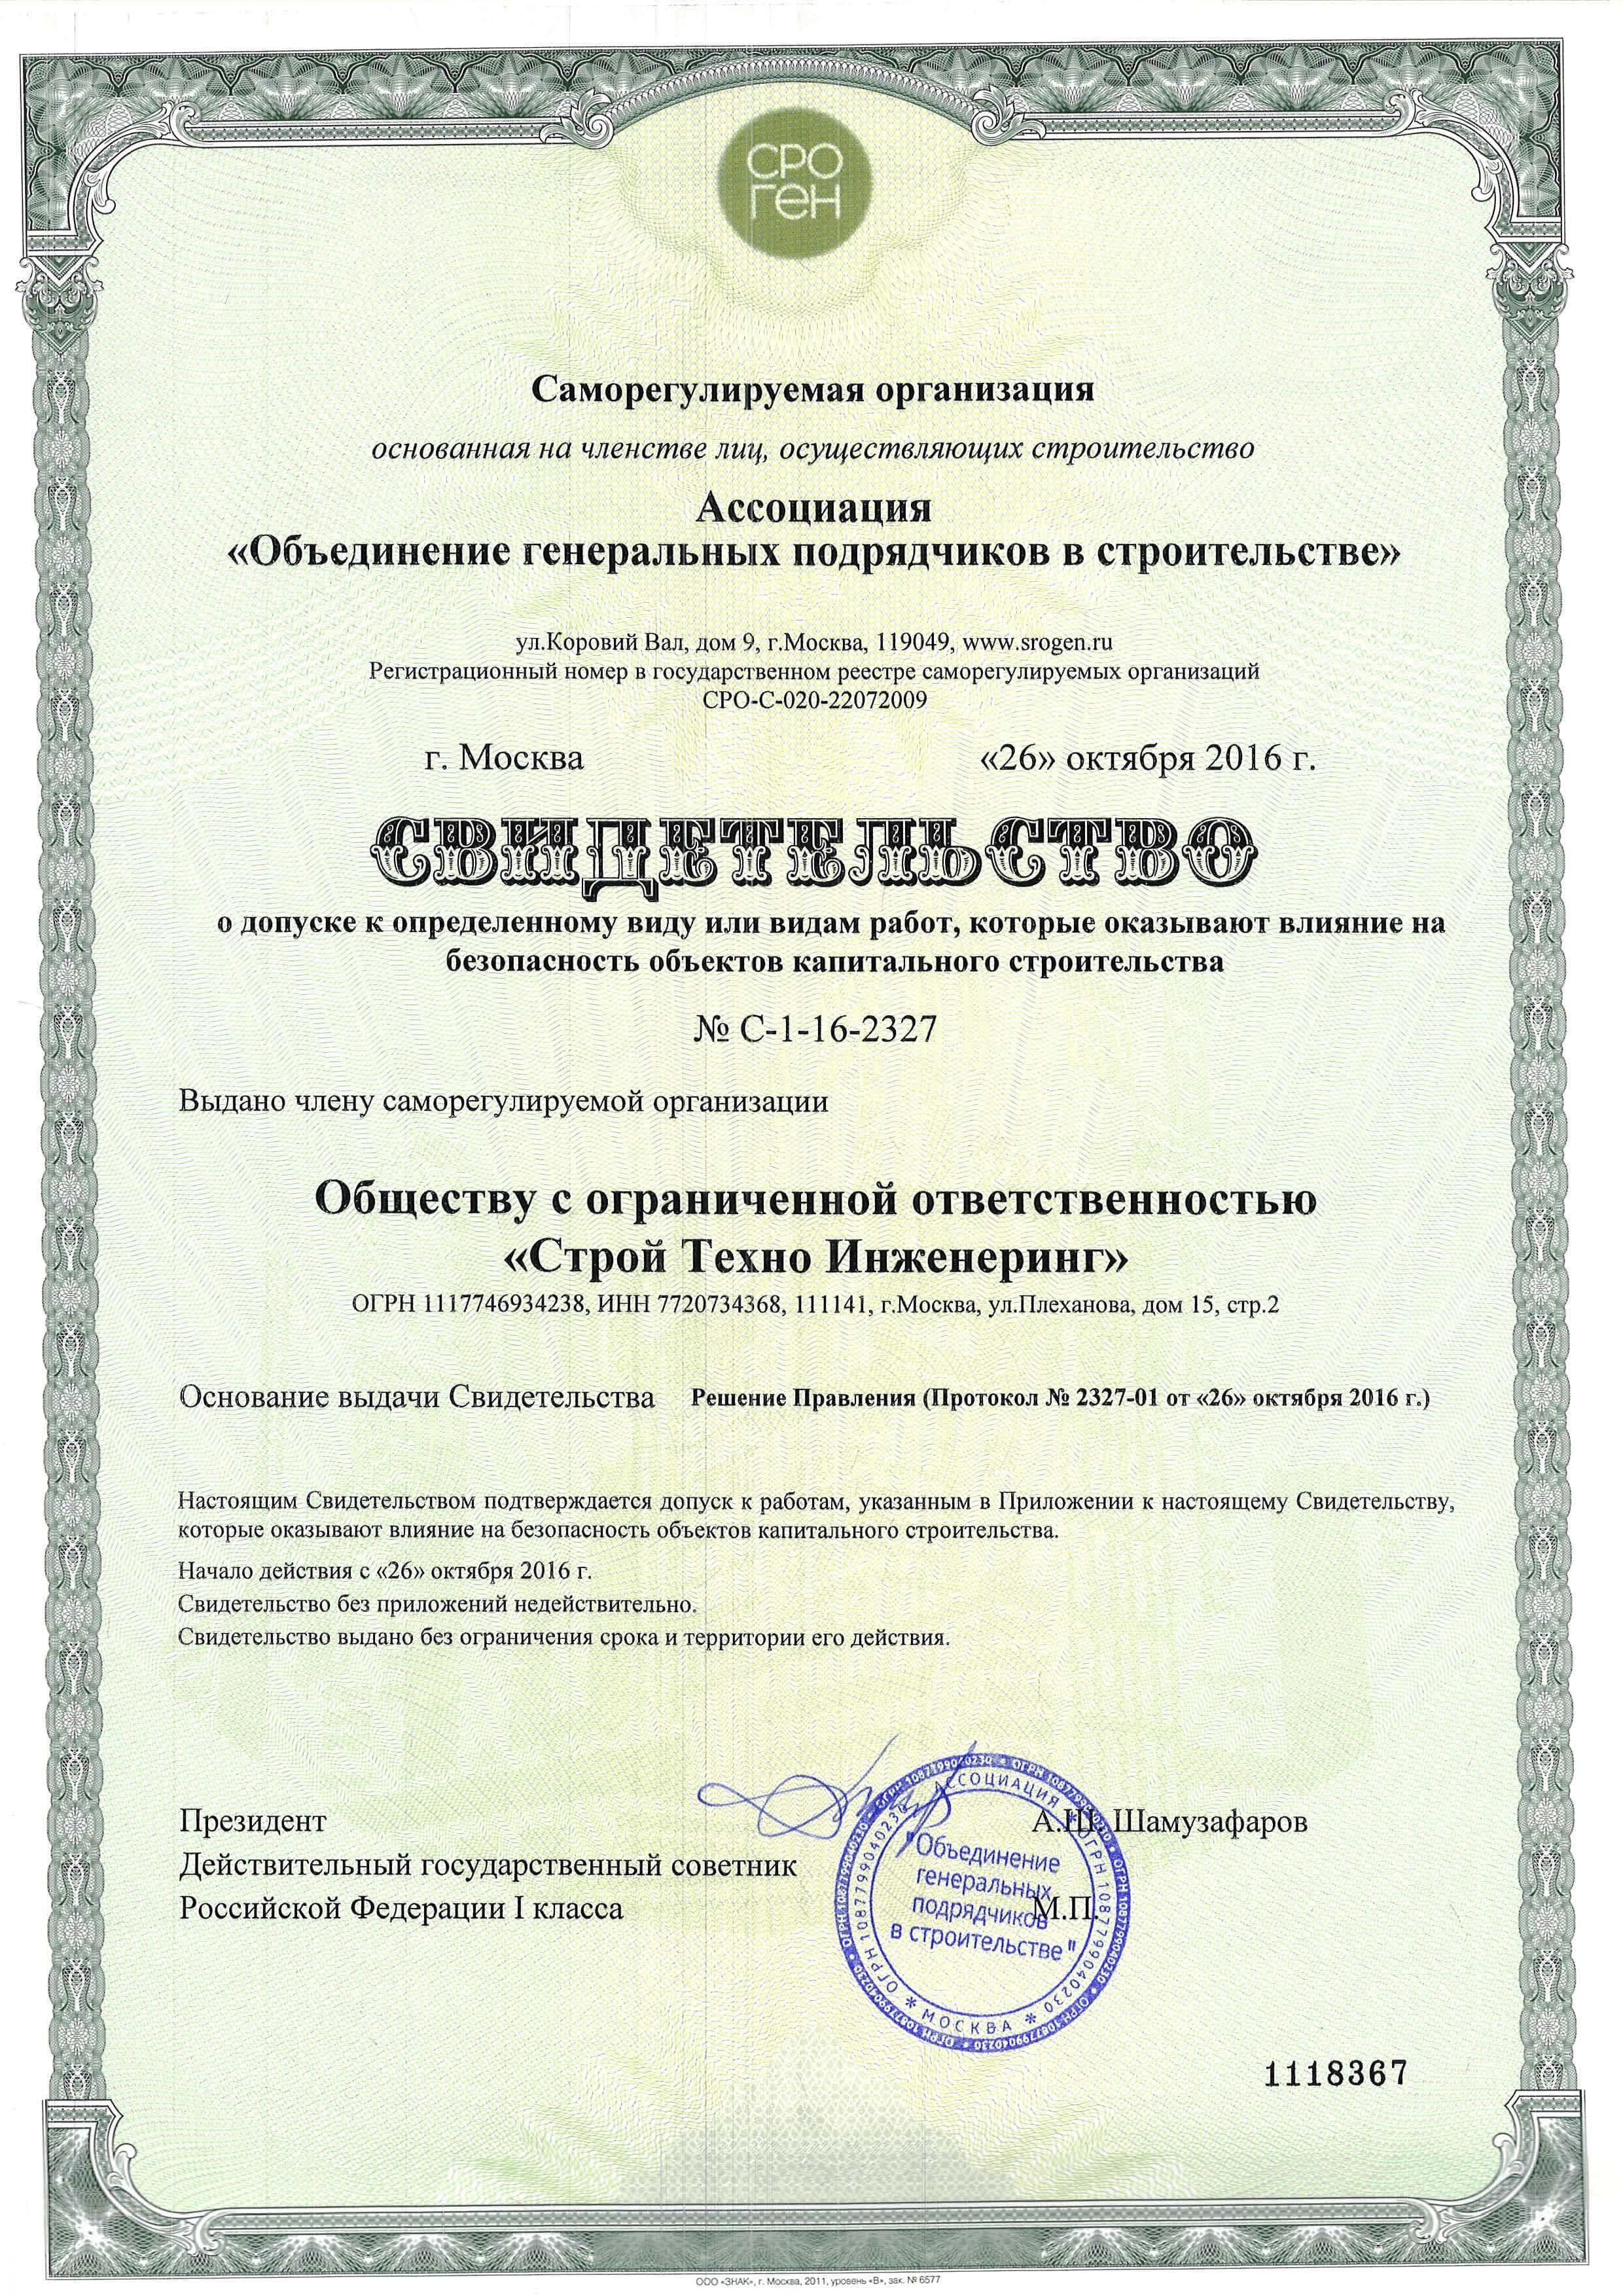 Сертификаты СТИ